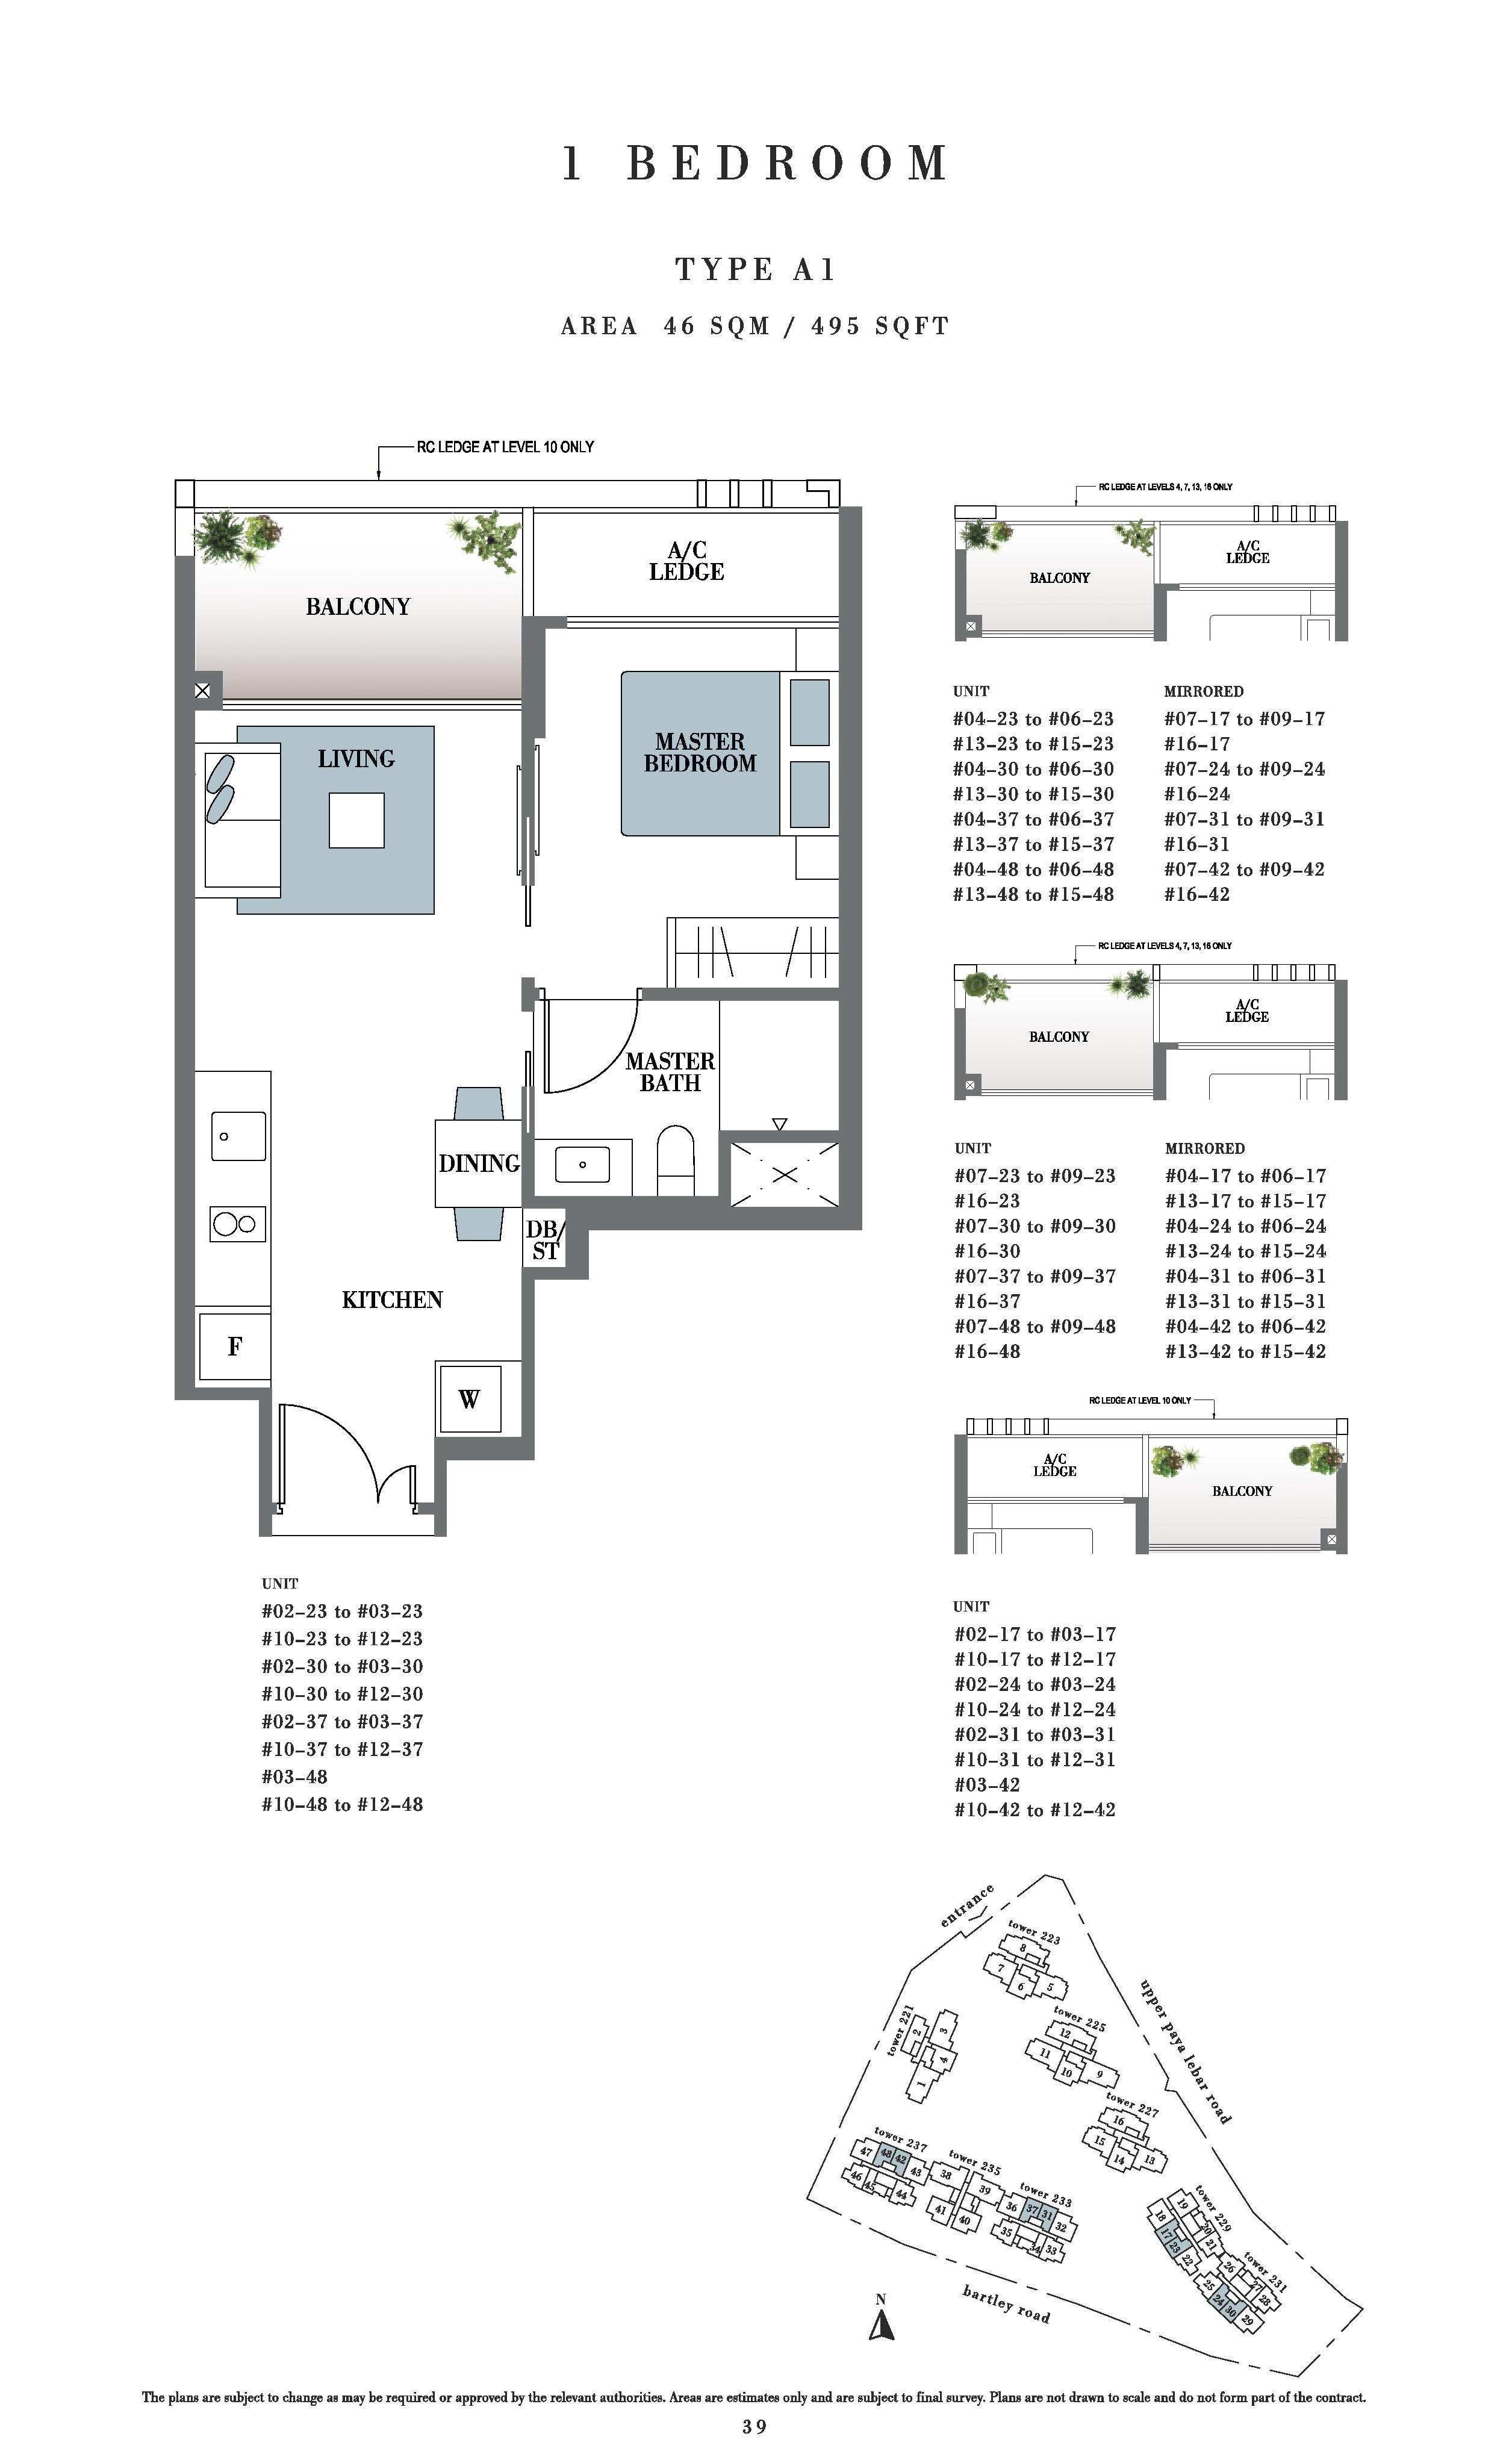 Botanique @ bartley 1 Bedroom Floor Plans Type A1